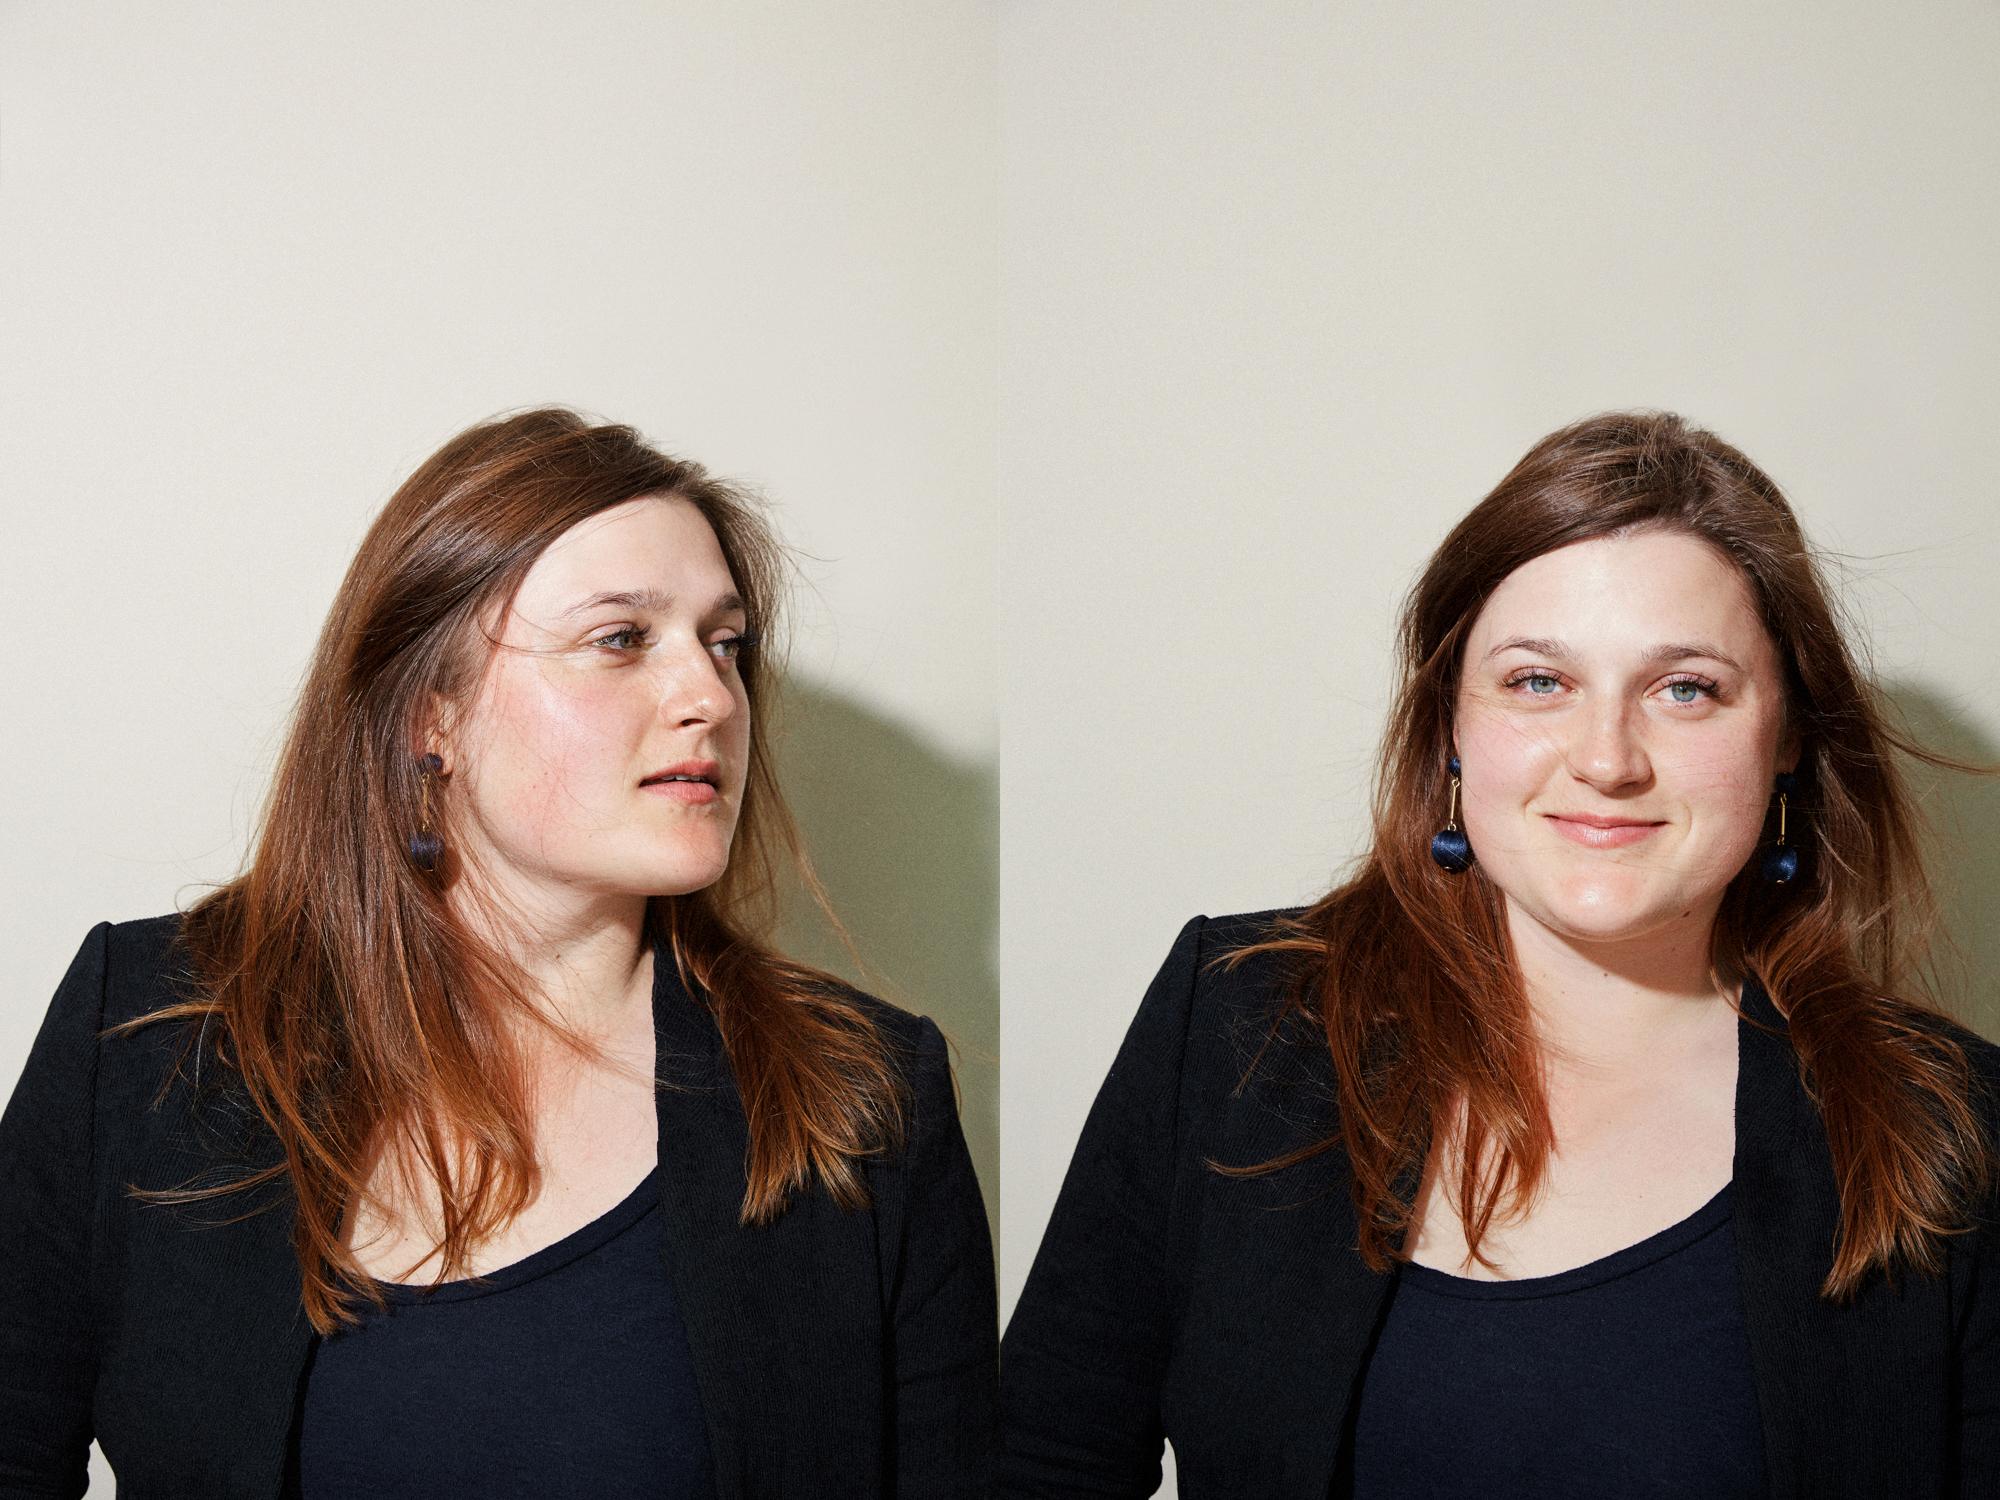 megan_grassell_women_in_wyoming_wyoming_entreprenuer_teen_founder_yellowberry_studio_portrait_duo_composite.jpg